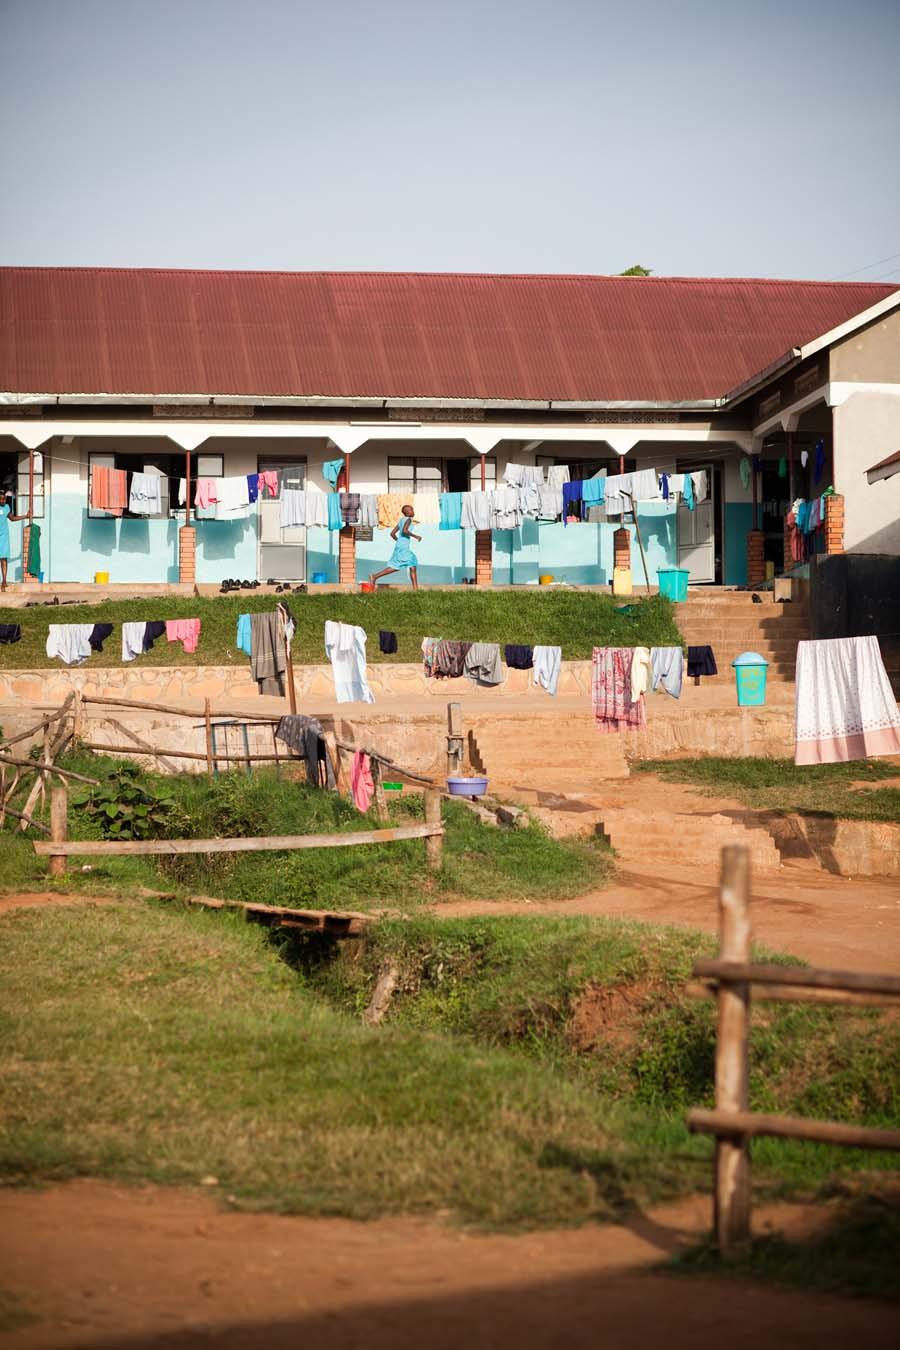 jessicadavisphotography.com | Jessica Davis Photography | Portrait Work in Uganda| Travel Photographer | World Event Photographs 5 (4).jpg